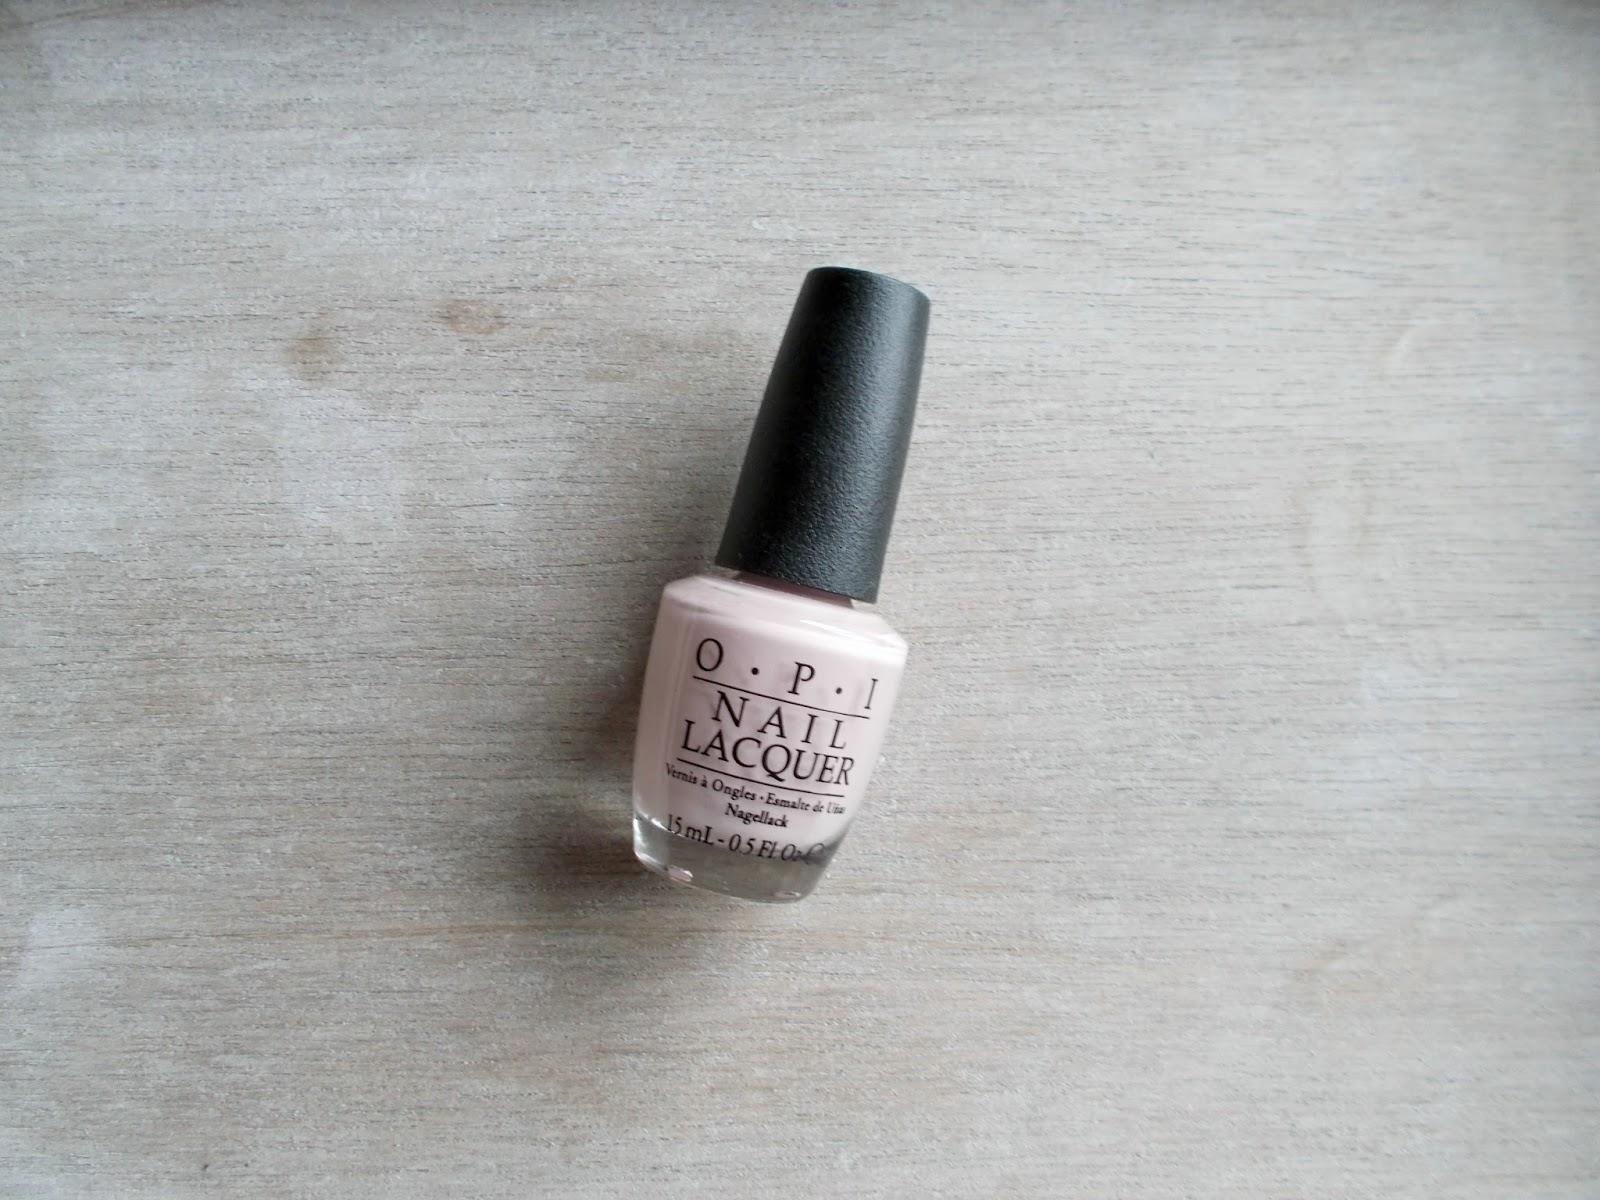 OPI My Very First Knockwurst nail polish